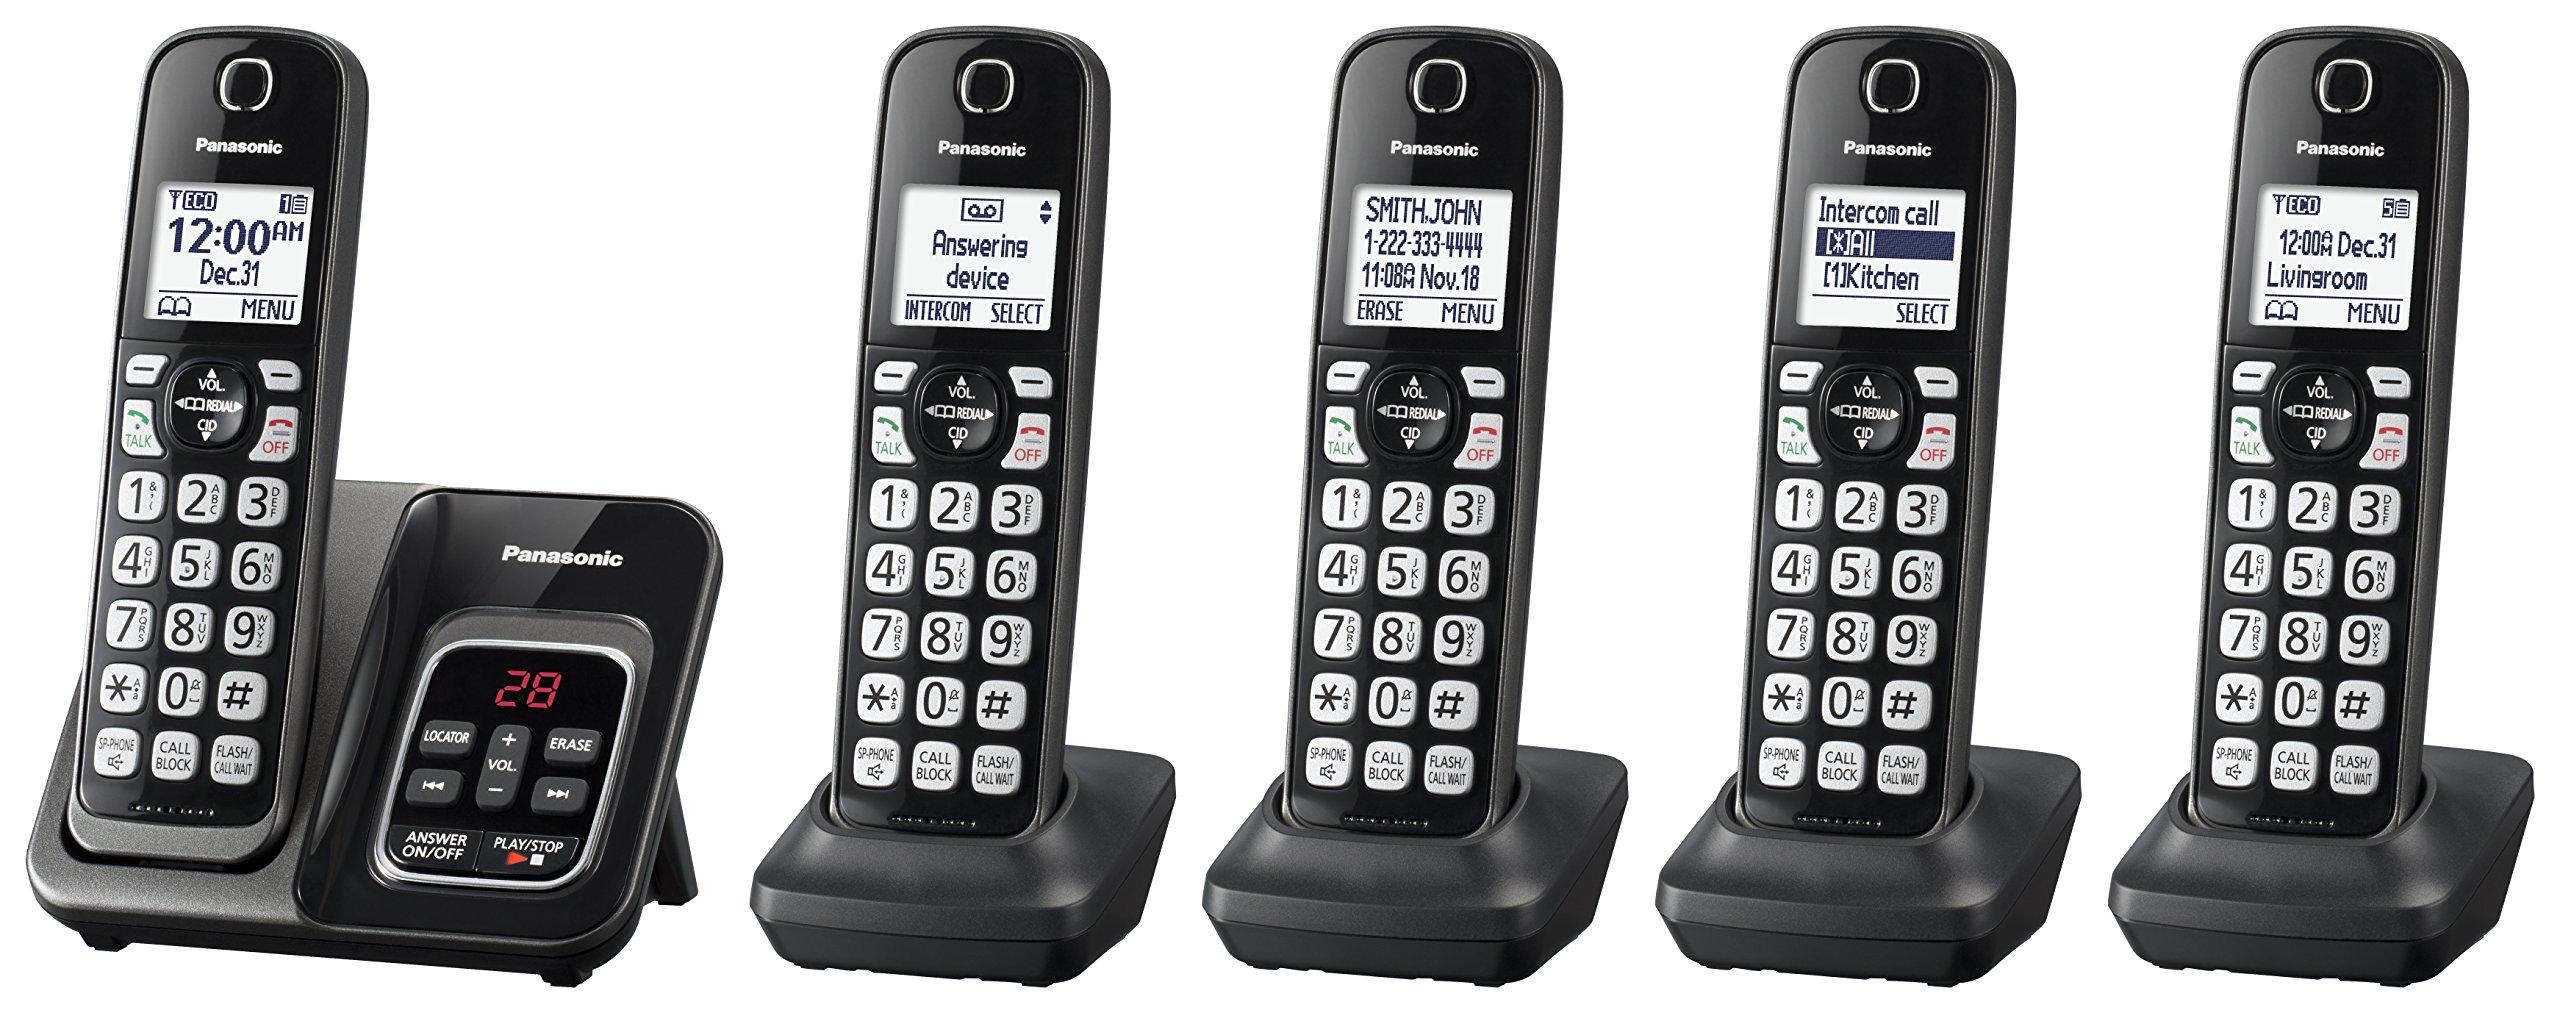 Panasonic KX-TGD535M Expandable Cordless Phone with Call Block and Answering Machine - 5 Handsets by Panasonic